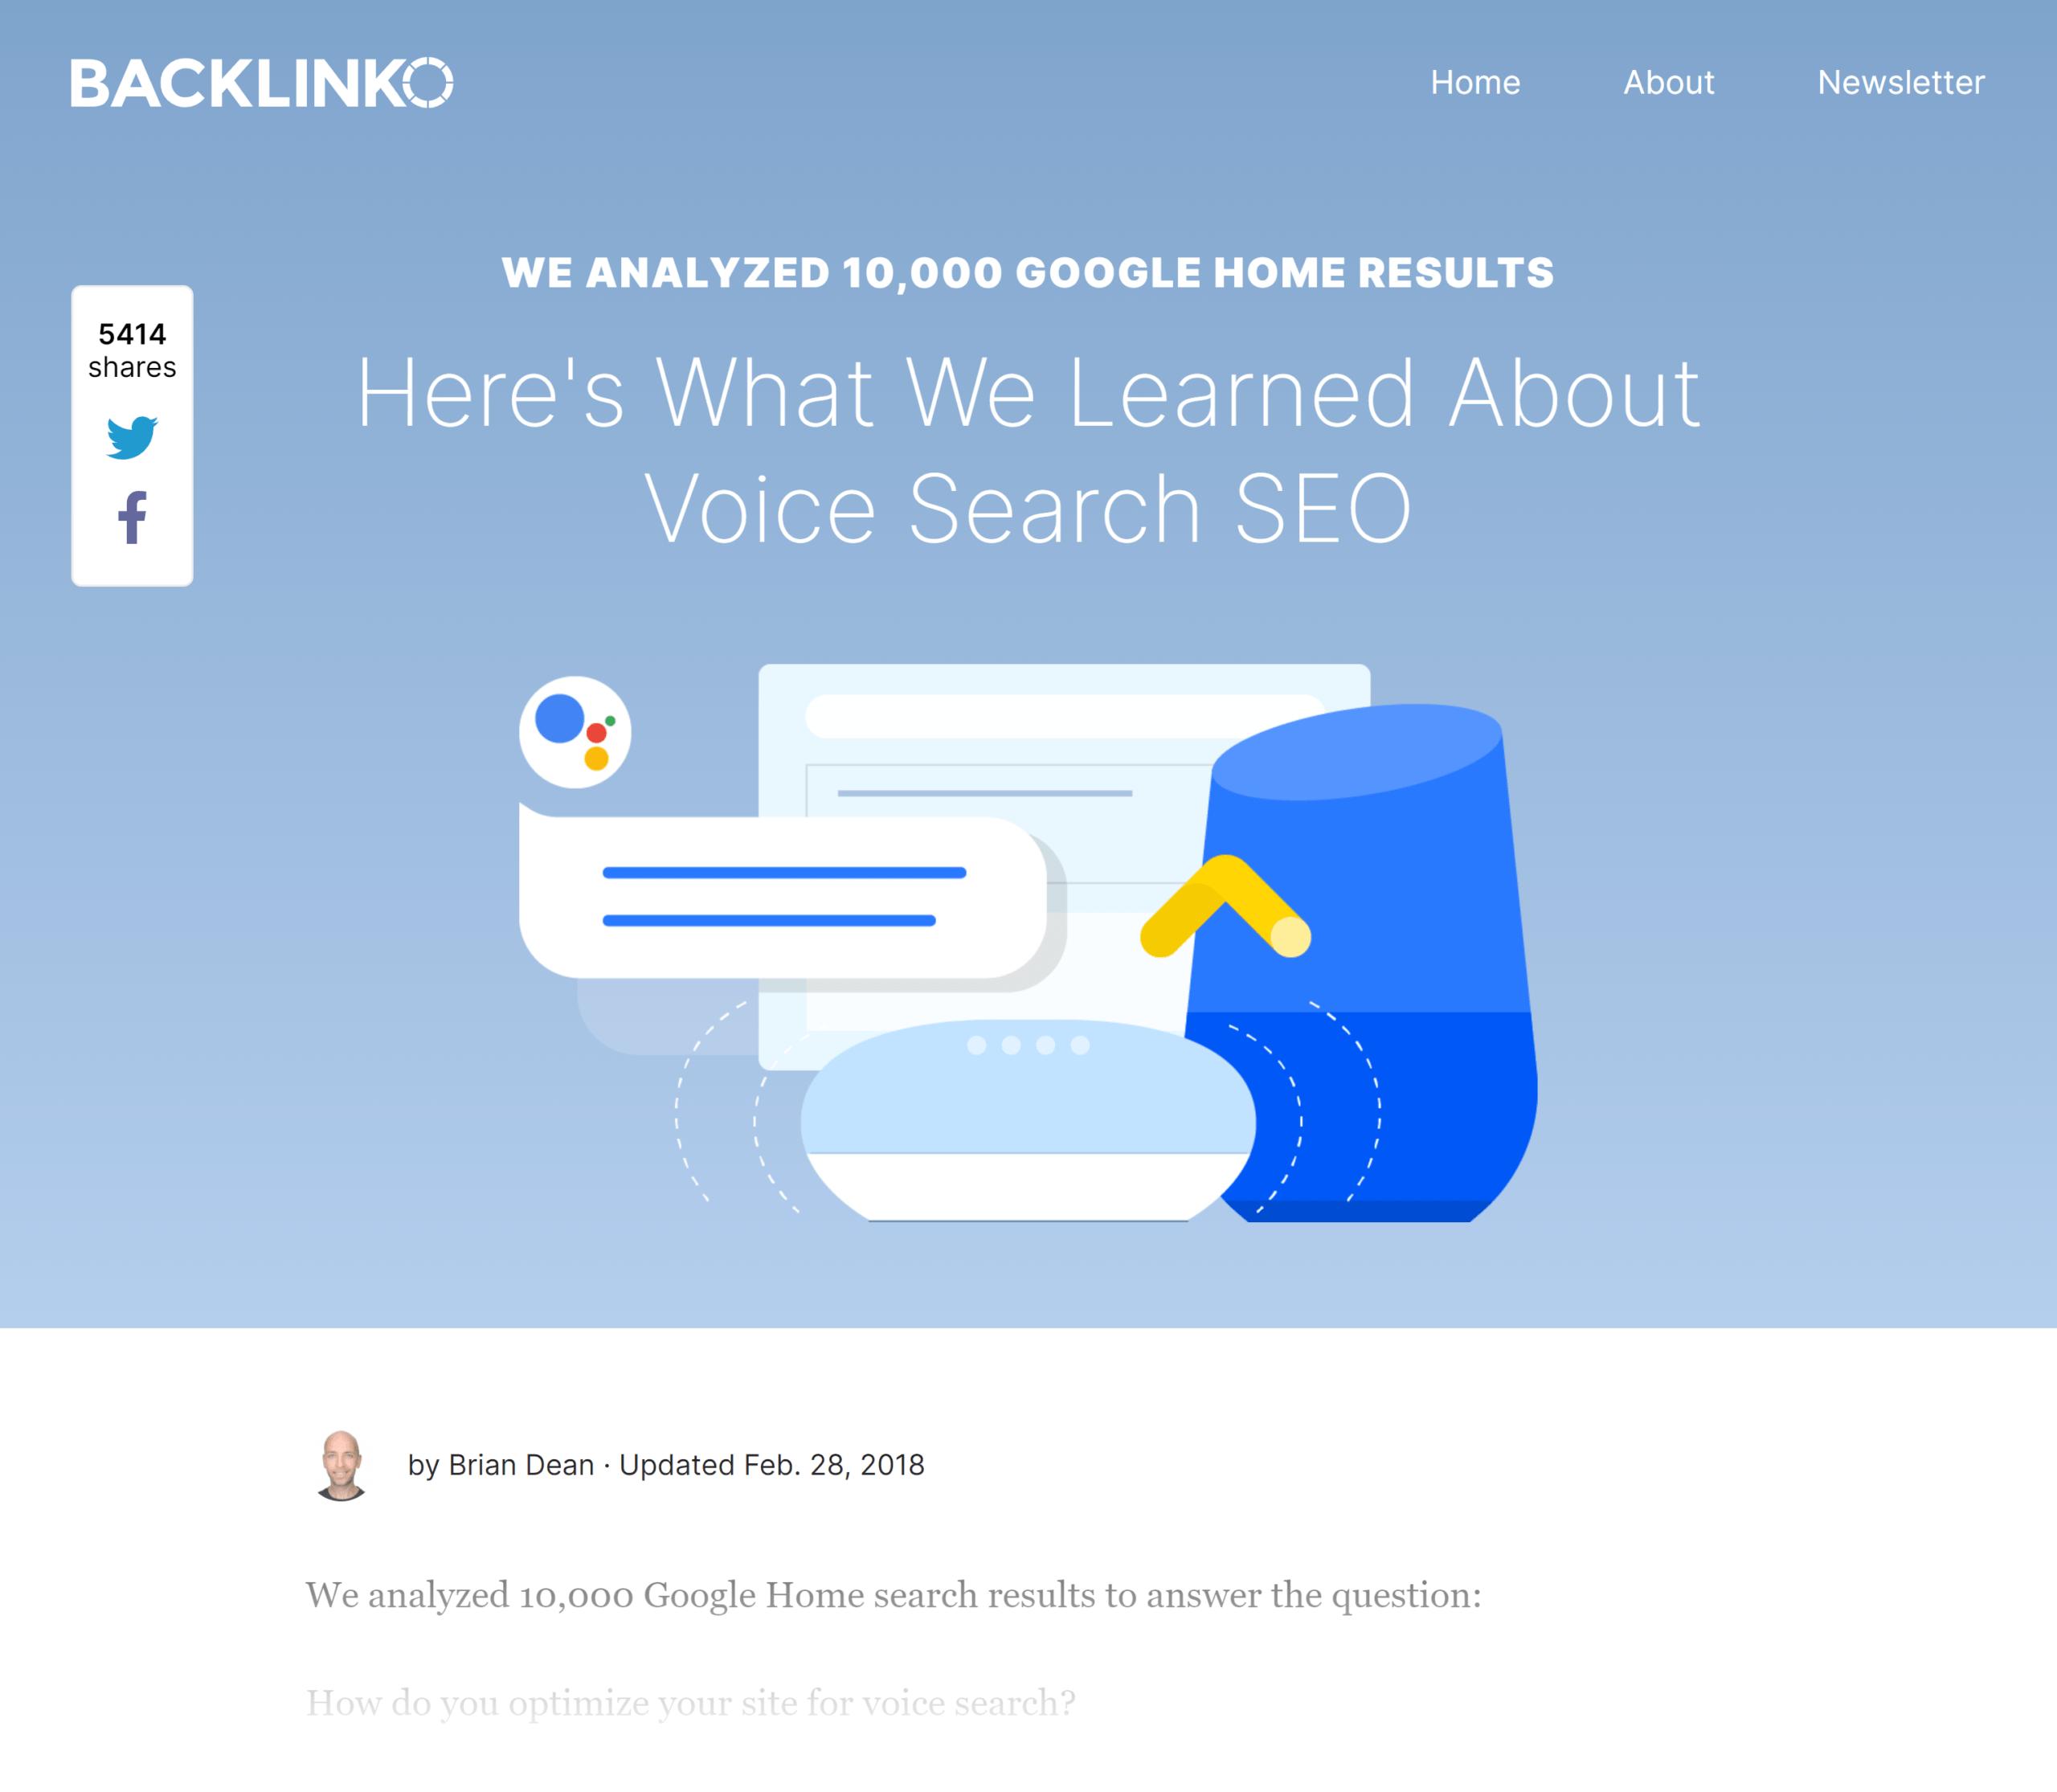 Backlinko – Voice search SEO study